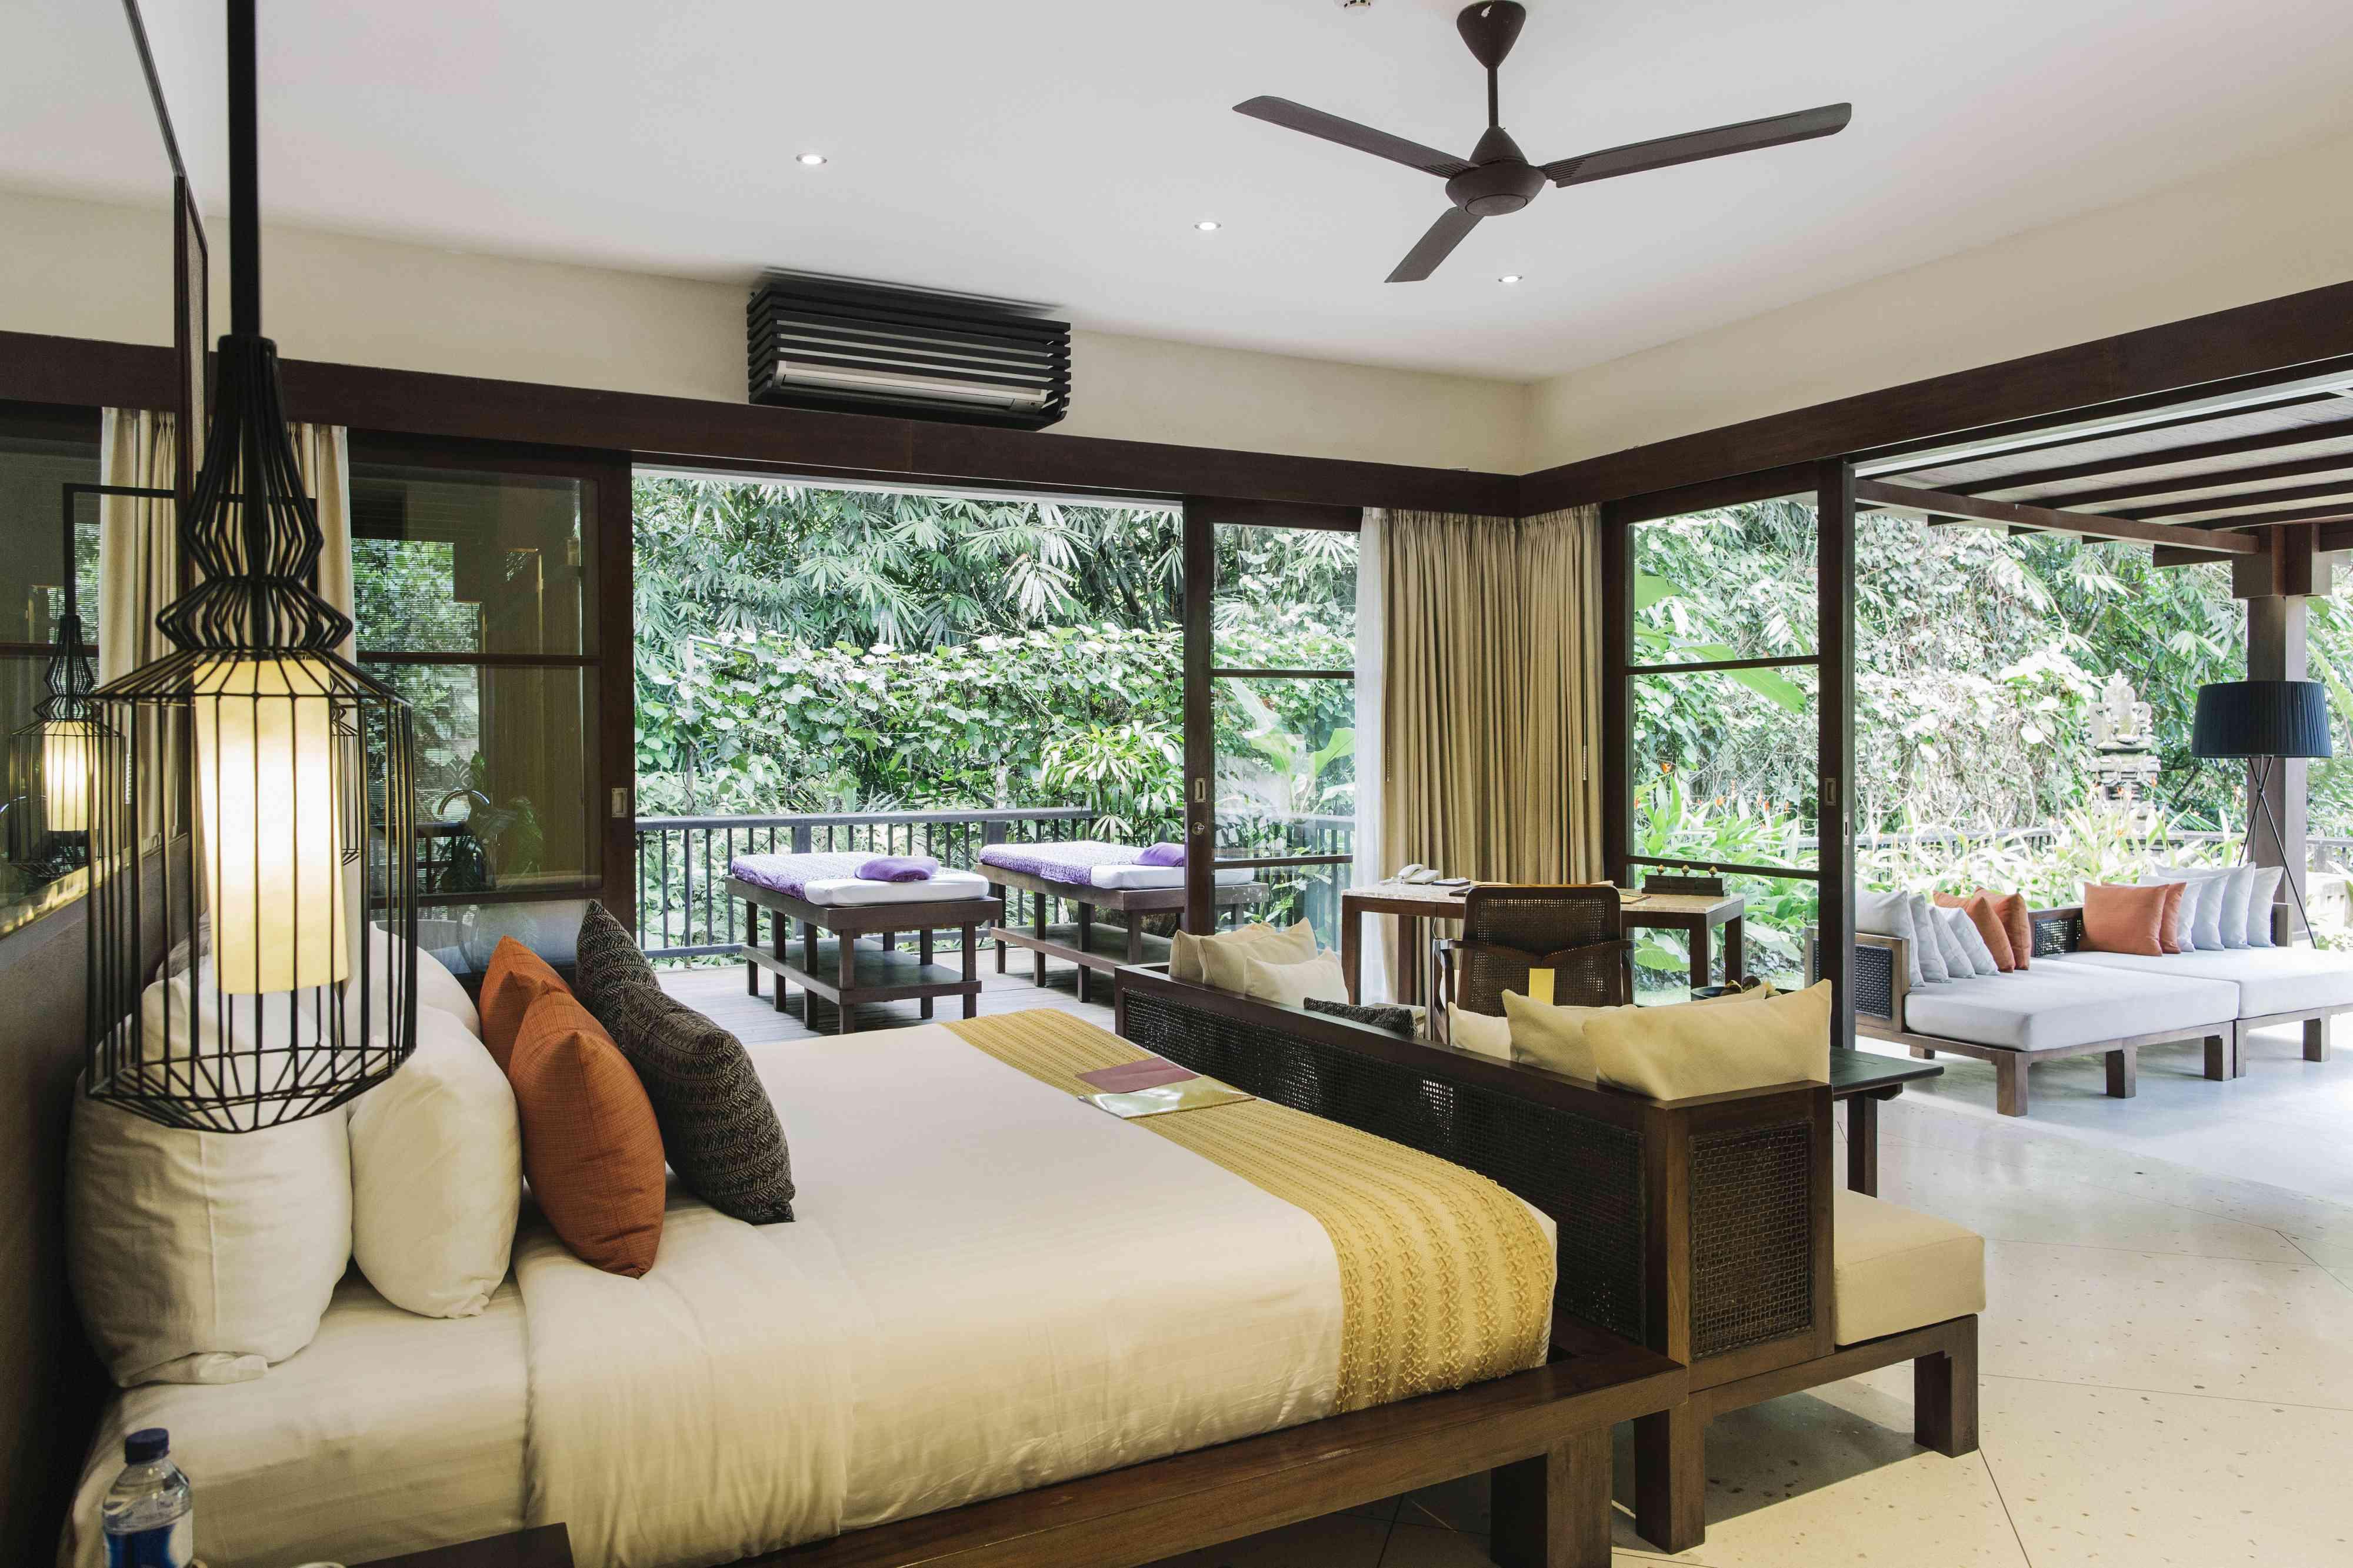 A nice hotel room in Bali